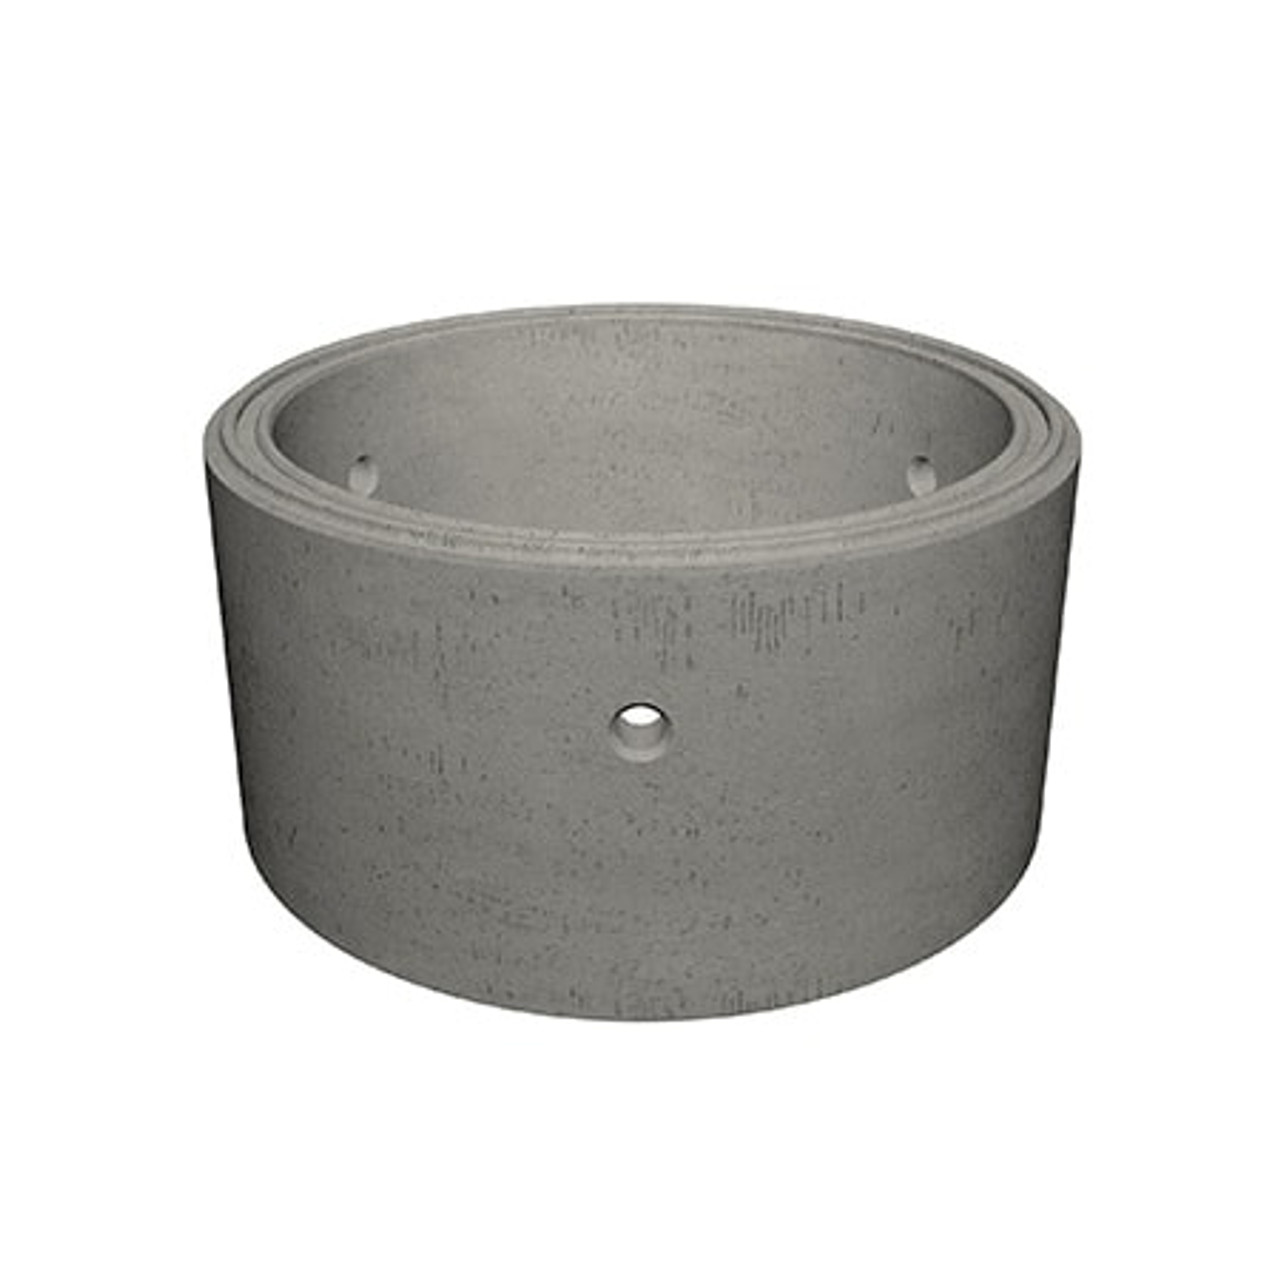 900 x 500mm Concrete Manhole Ring.